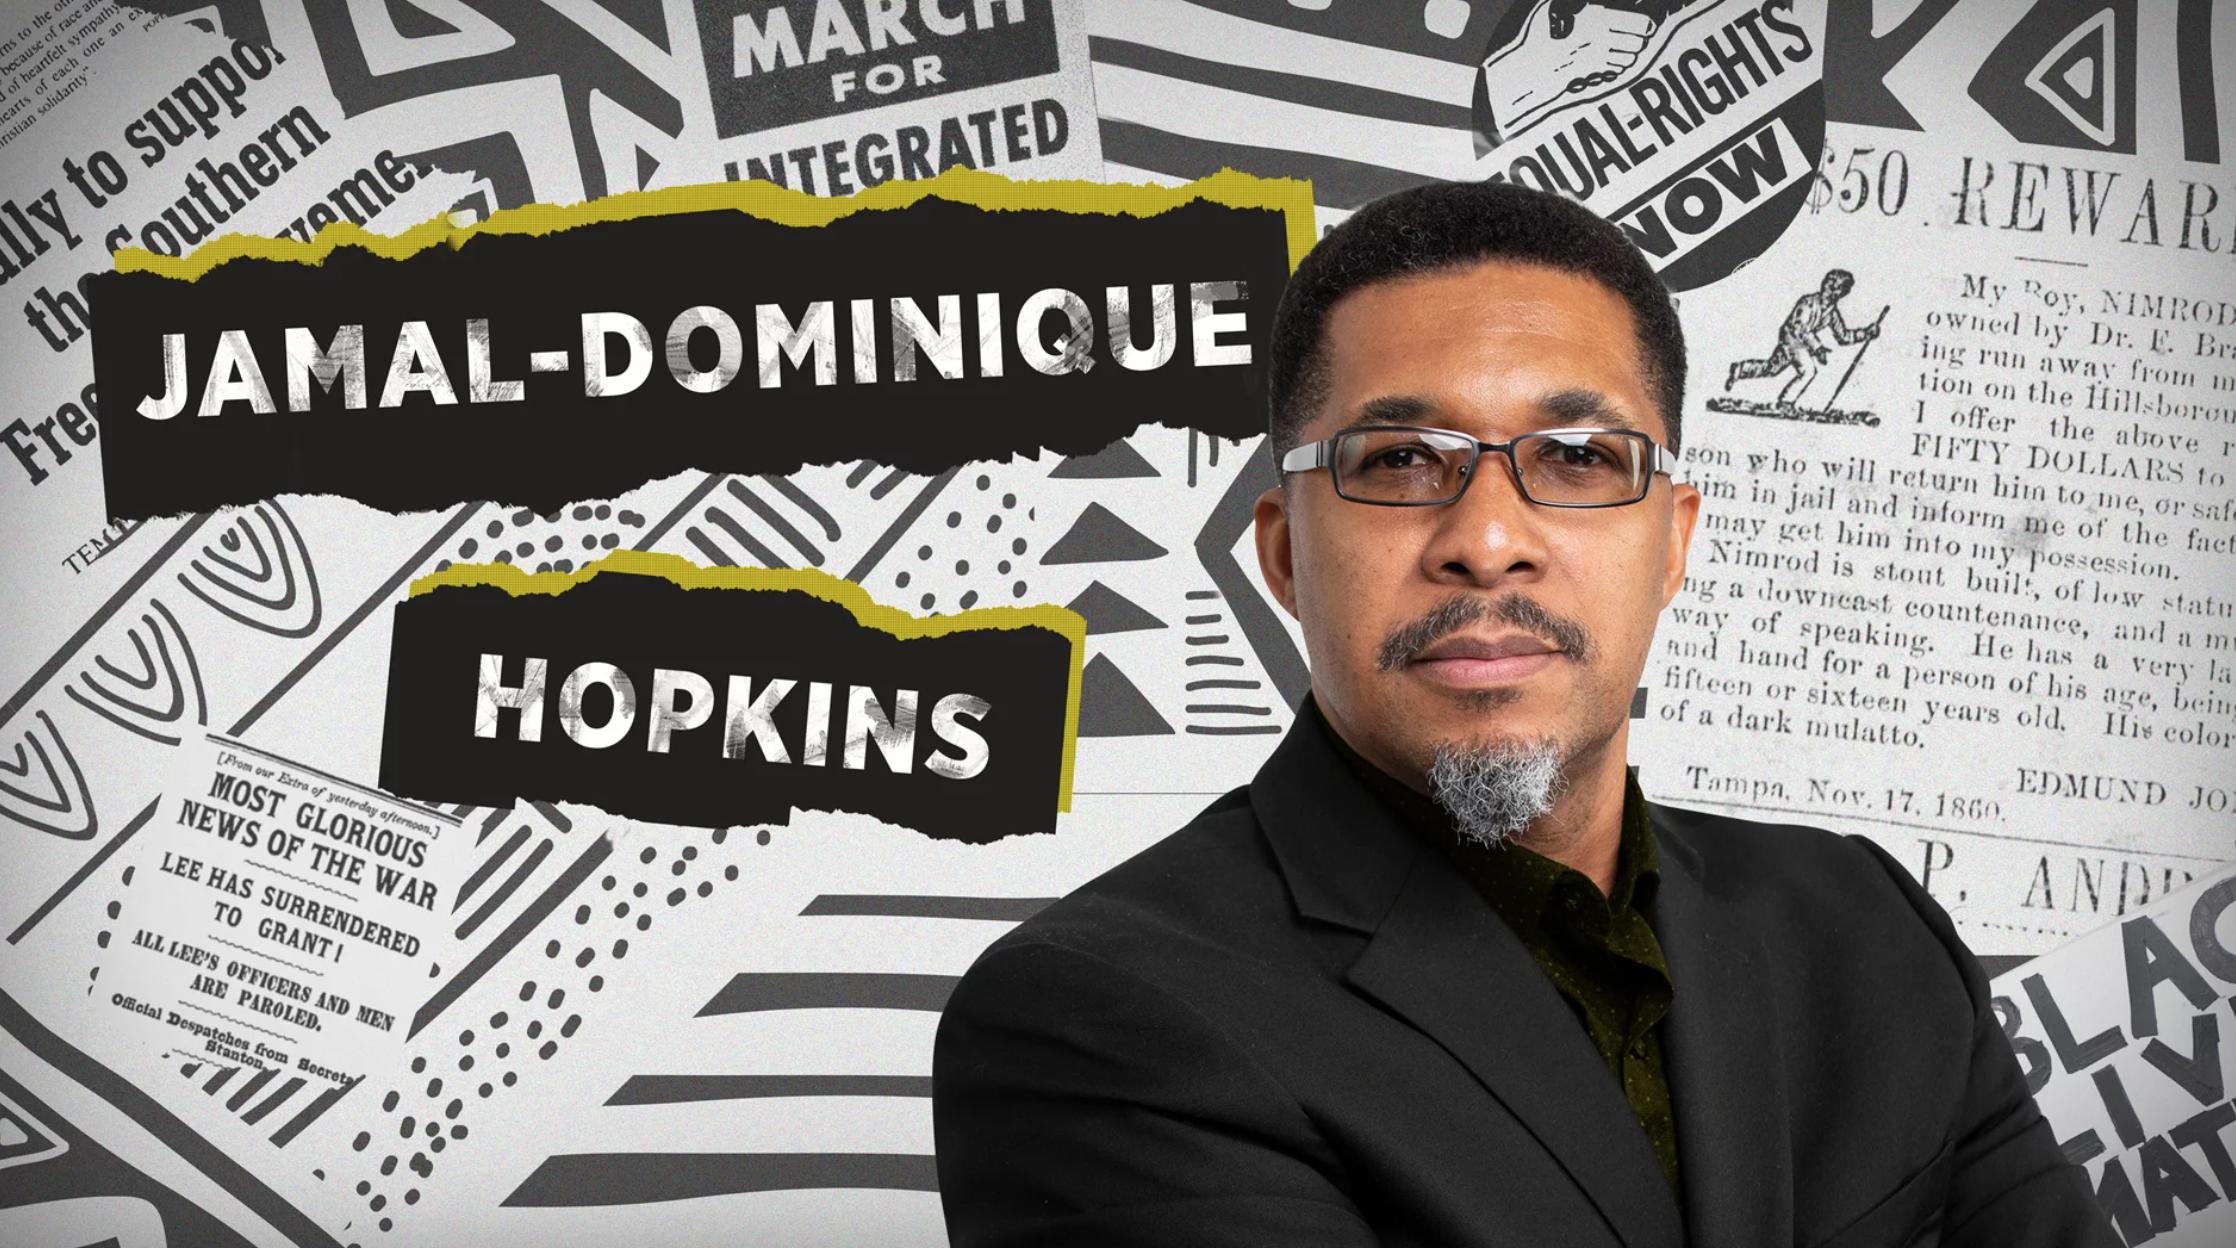 Jamal- Dominique Hopkins